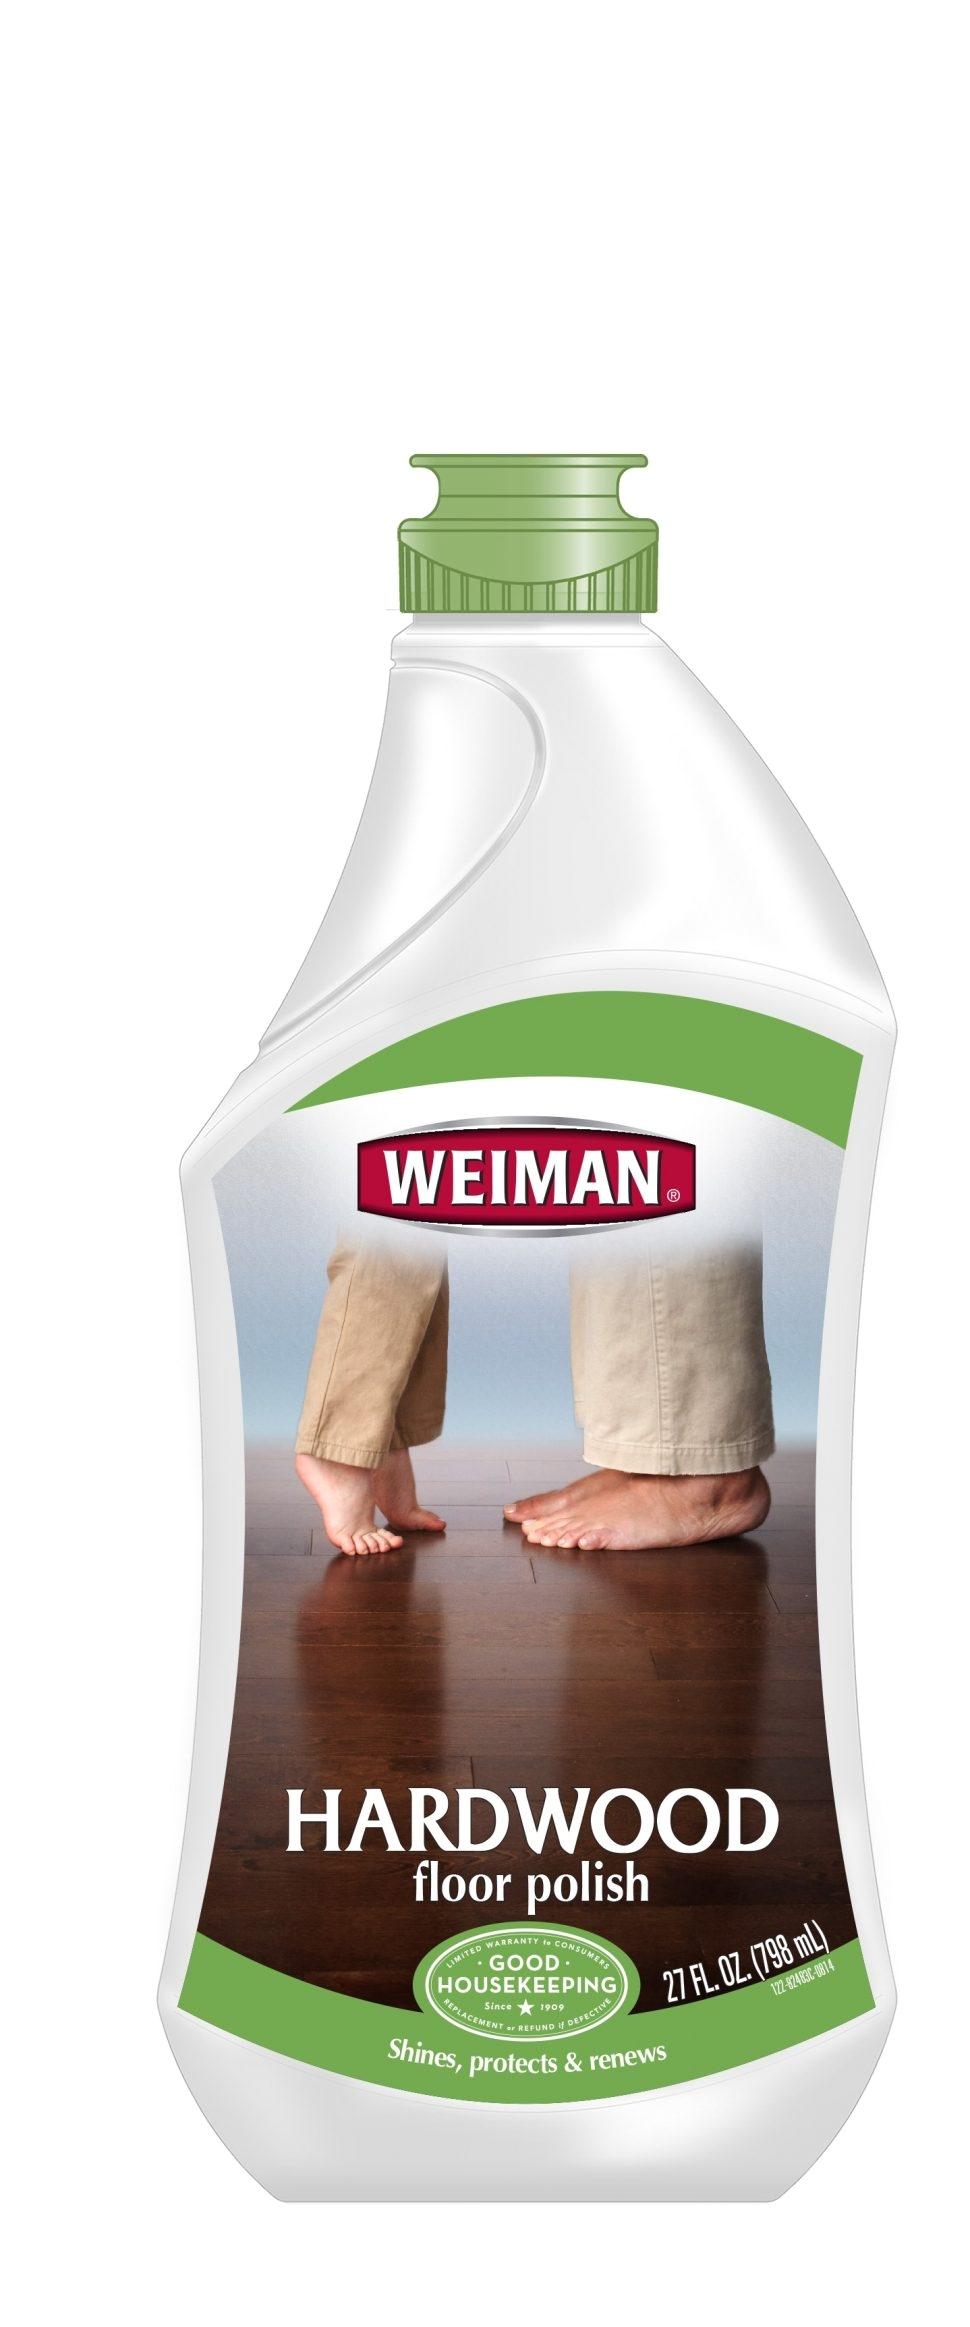 large size of hardwood floor cleaning weiman hardwood floor cleaner scrub free soap scum remover